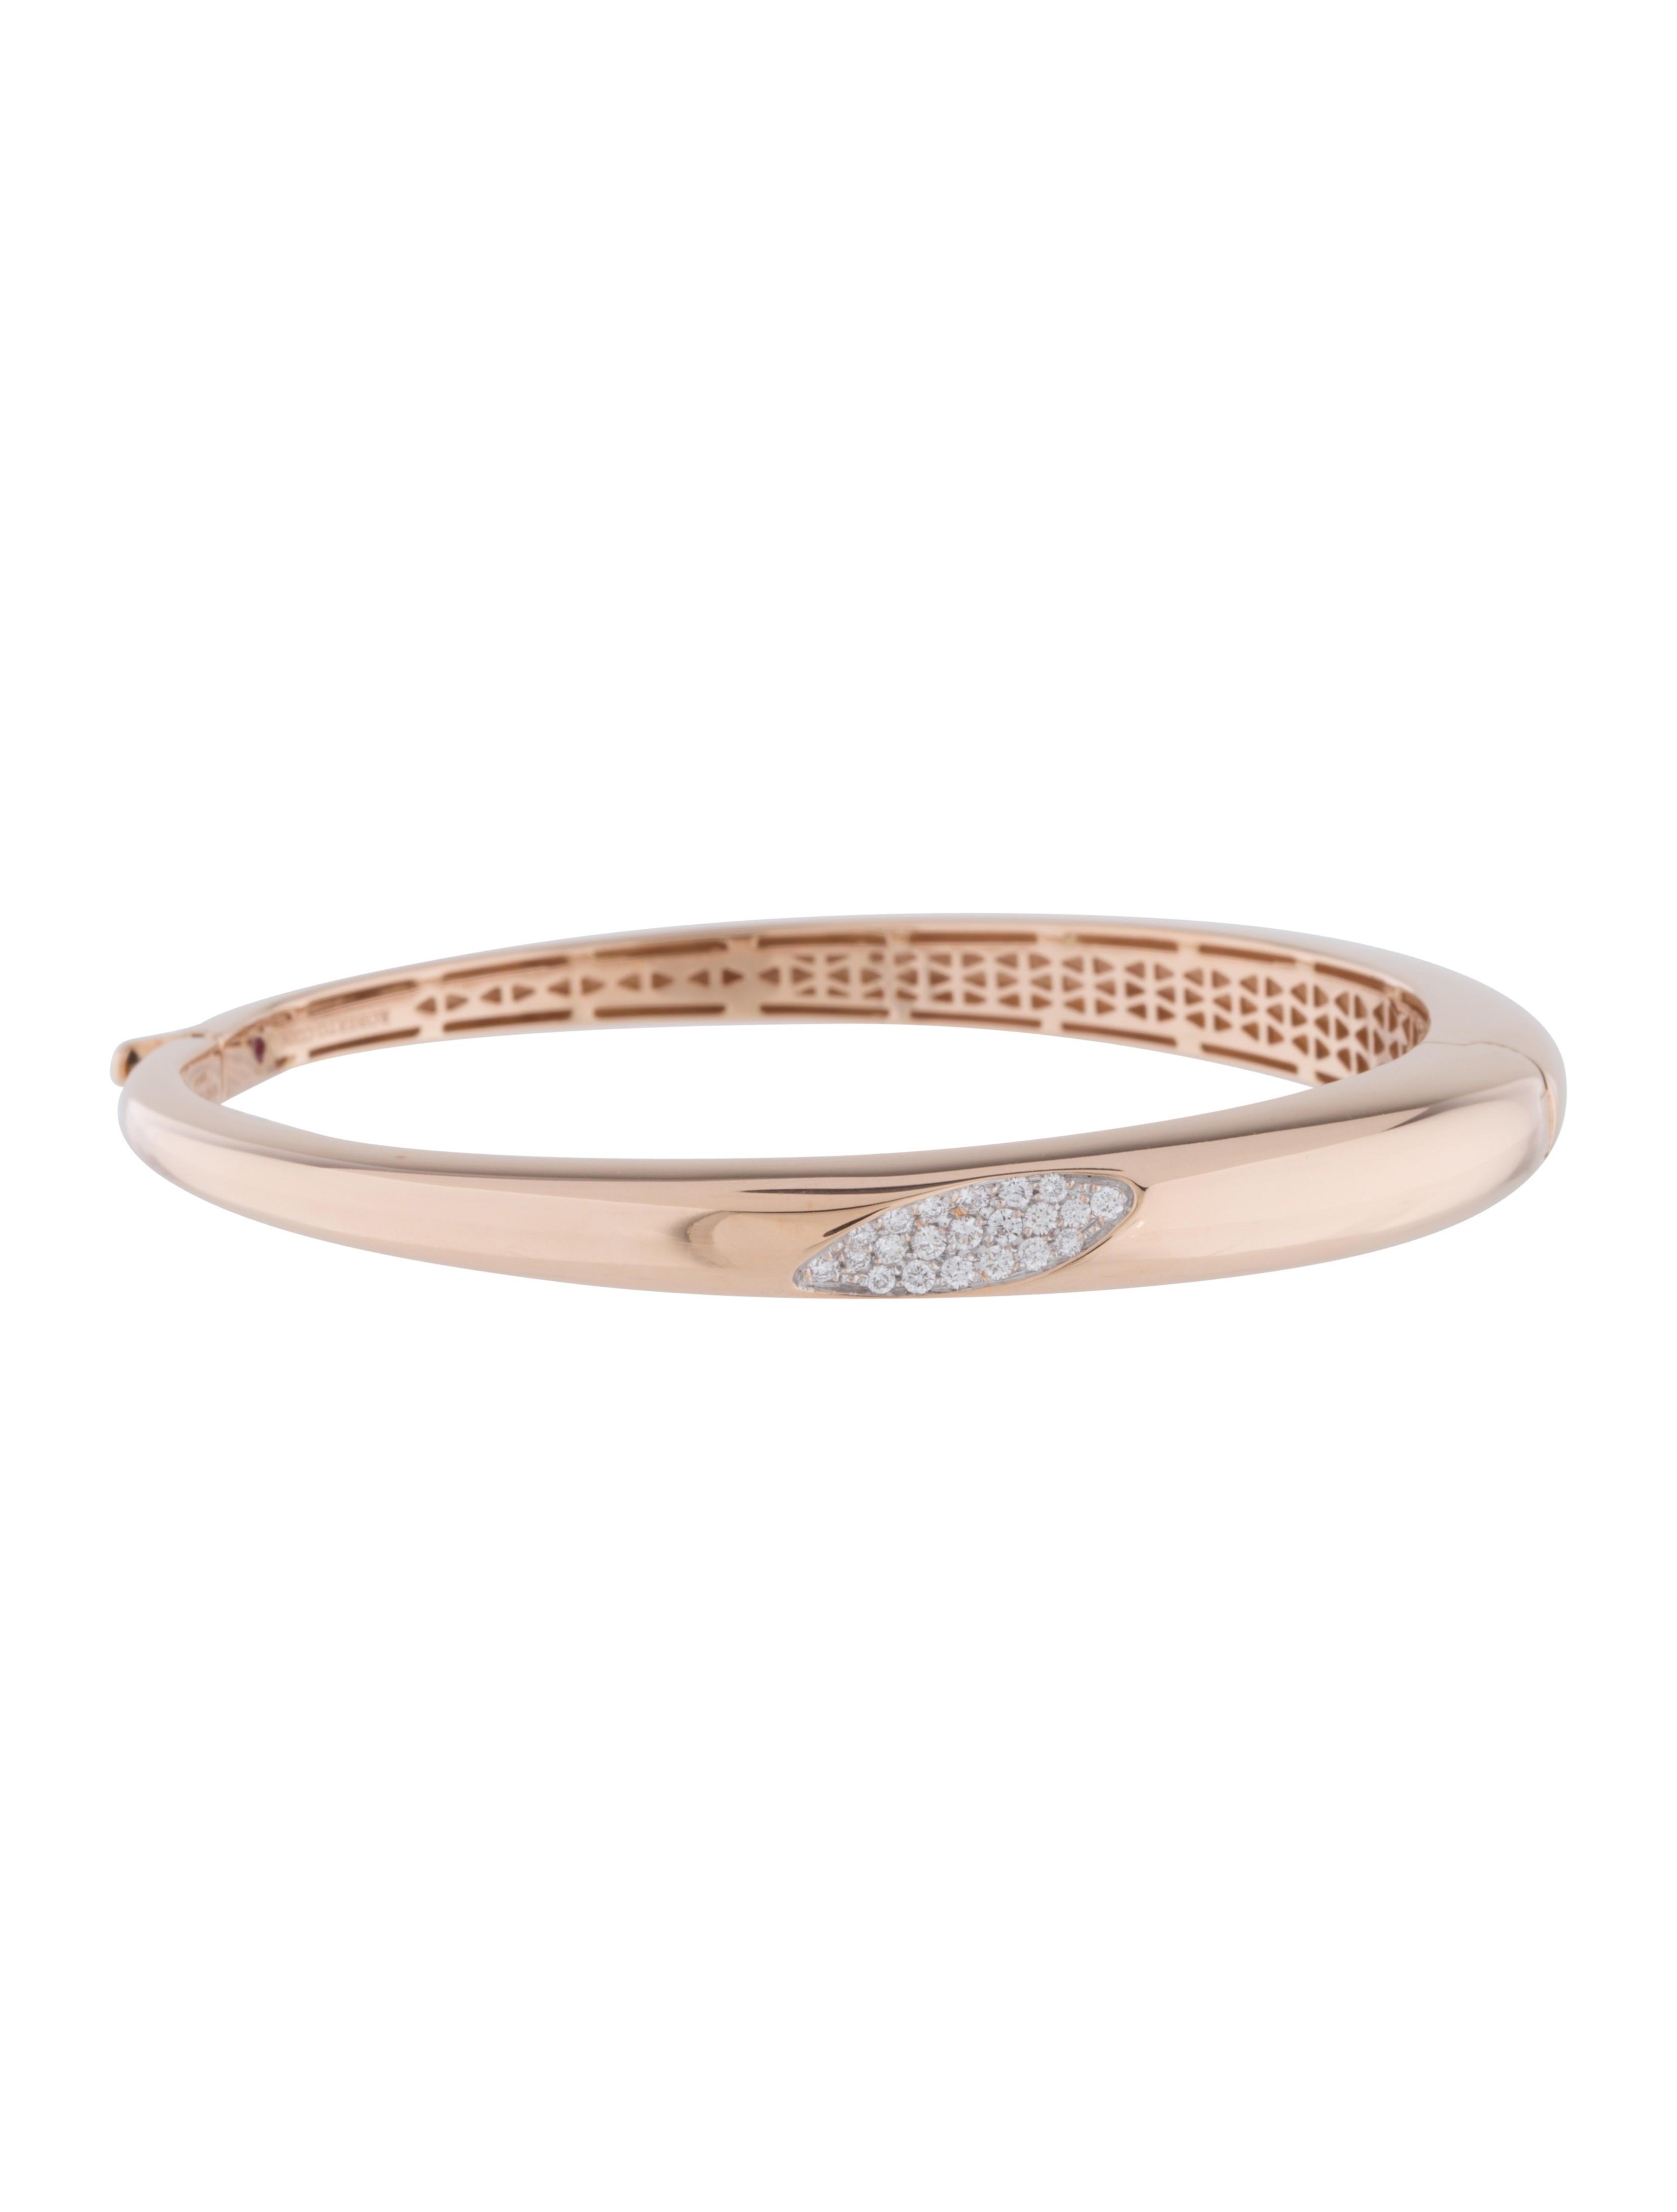 Roberto Coin Capri Plus Diamond Bangle Bracelet in 18k Rose Gold M6ymfLT3m